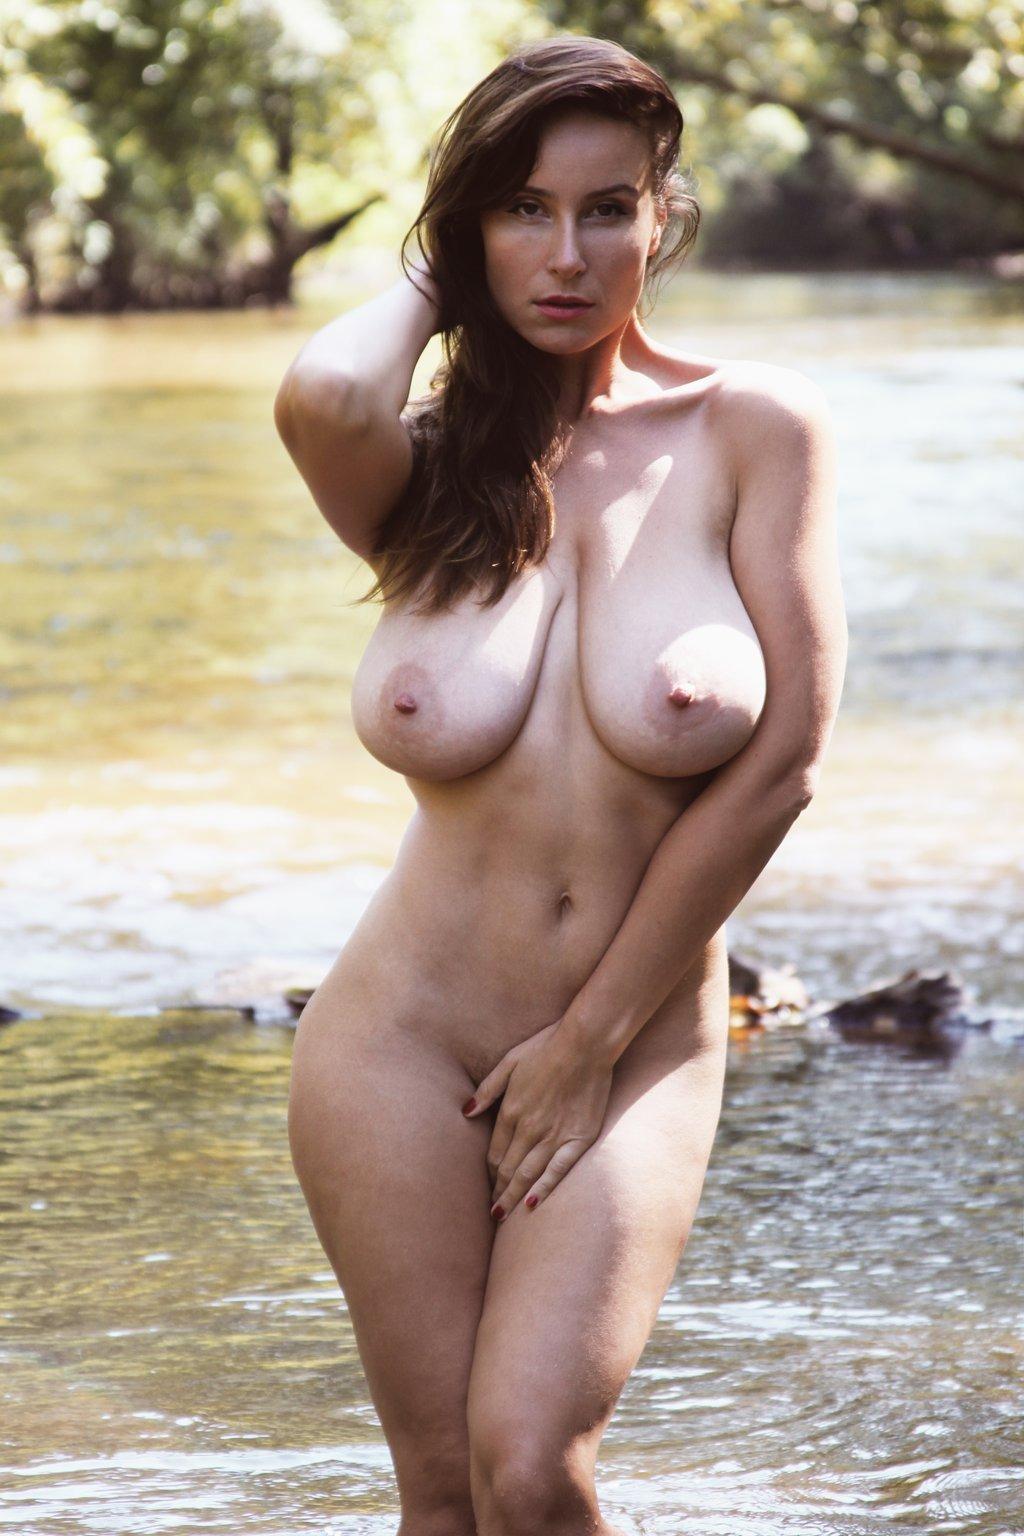 golie-starie-blyadi-foto